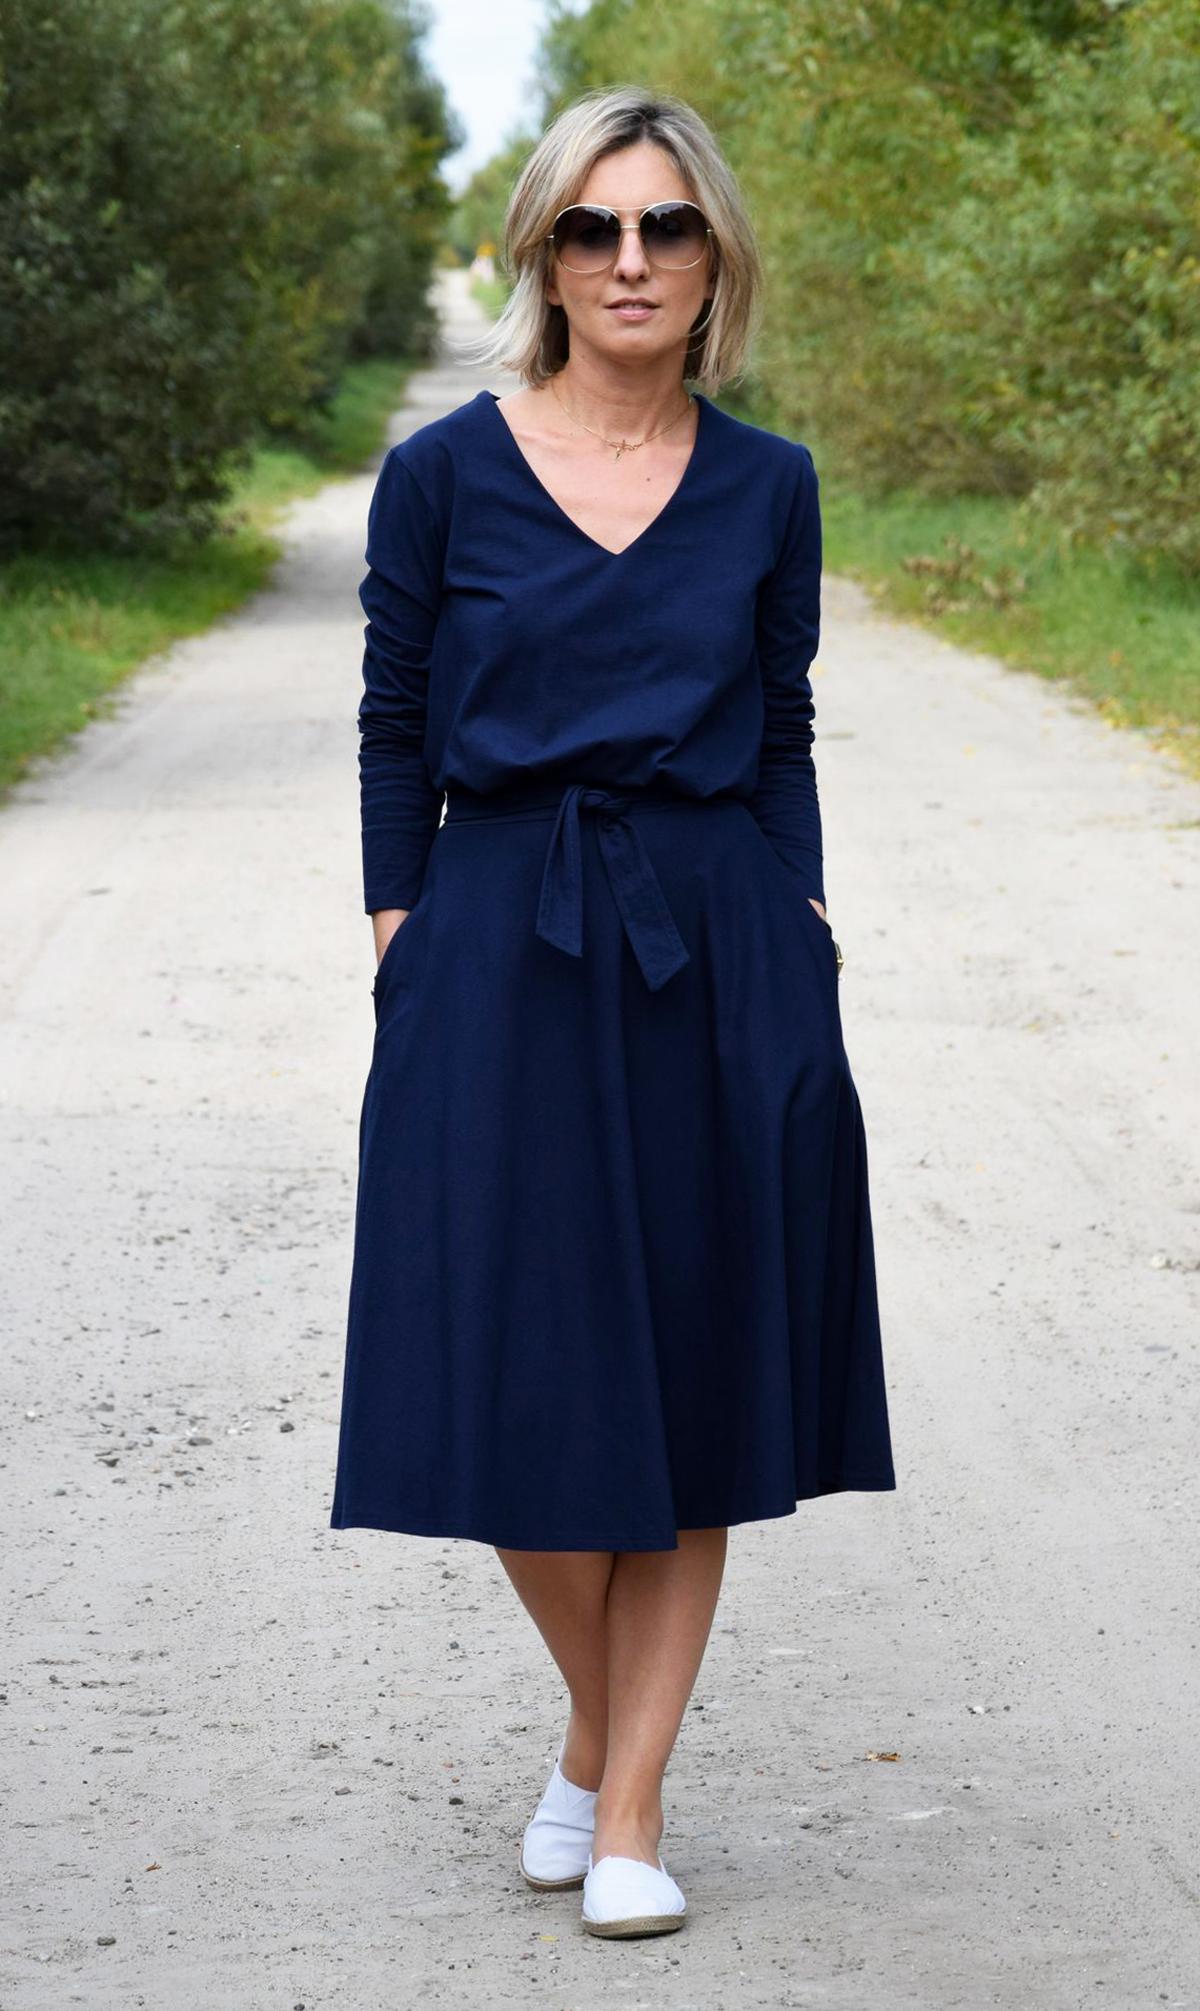 Jennifer V Ausschnitt Baumwolle Midi Kleid Navy Blau Sisters Www Shopsisters Eu